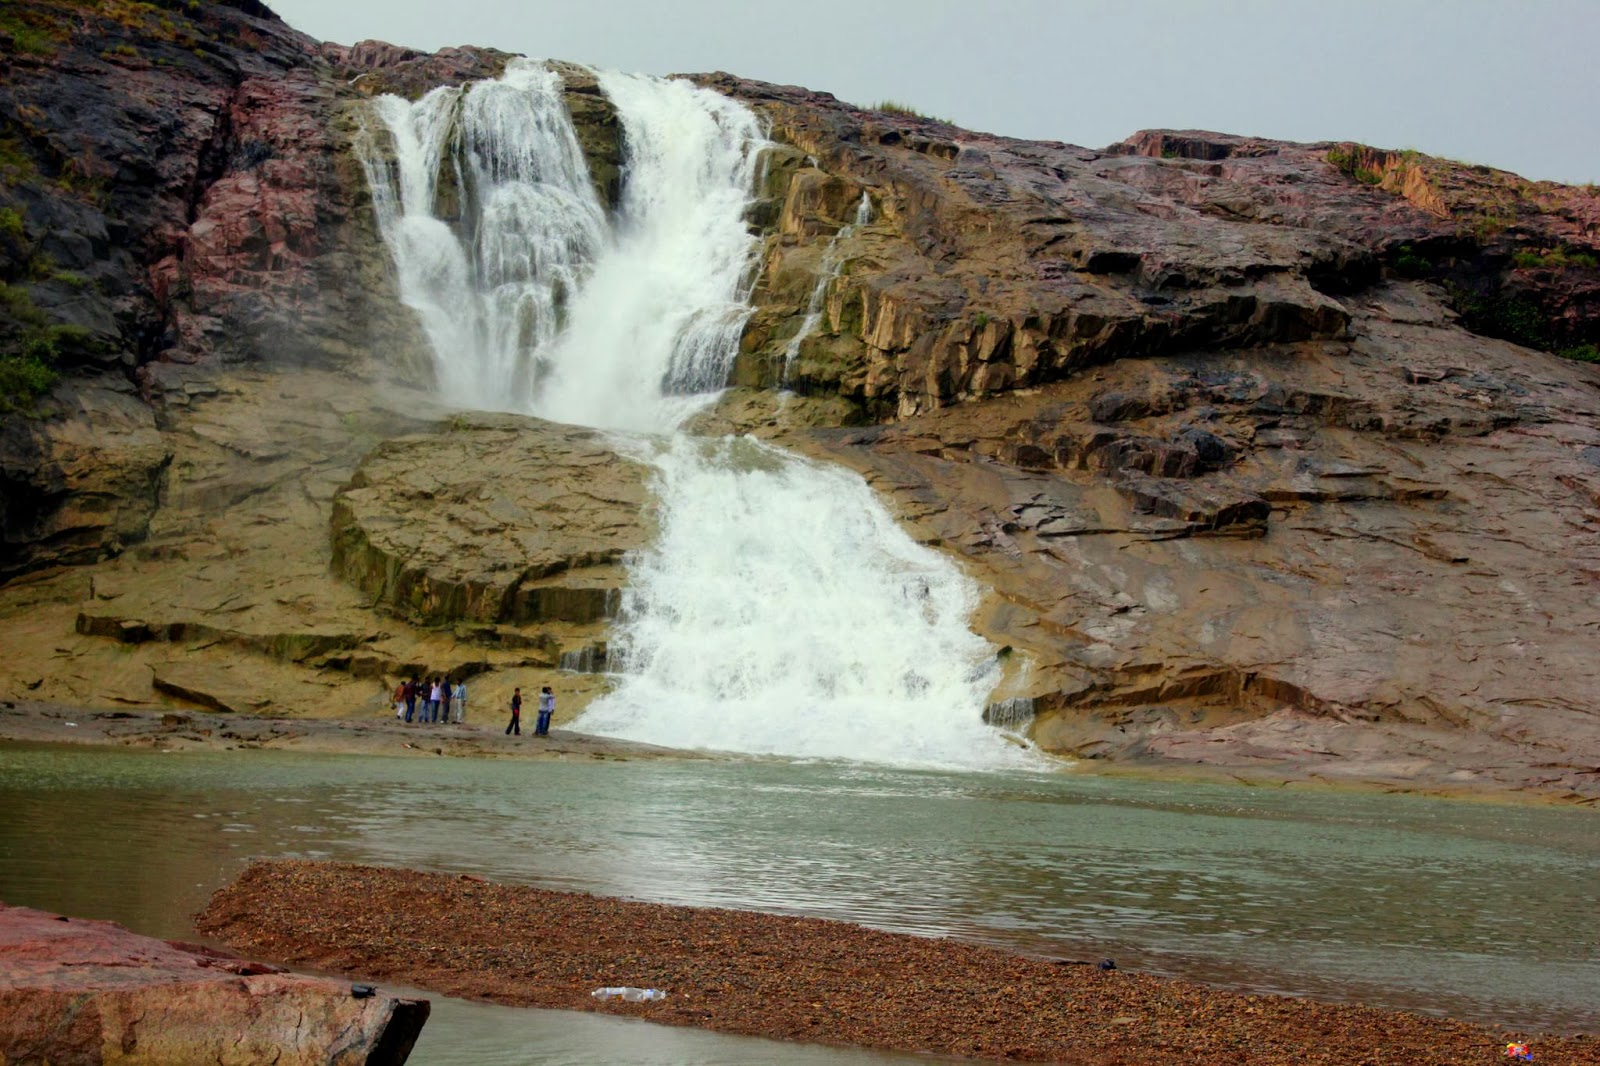 Kuntala Waterfalls in Telangana